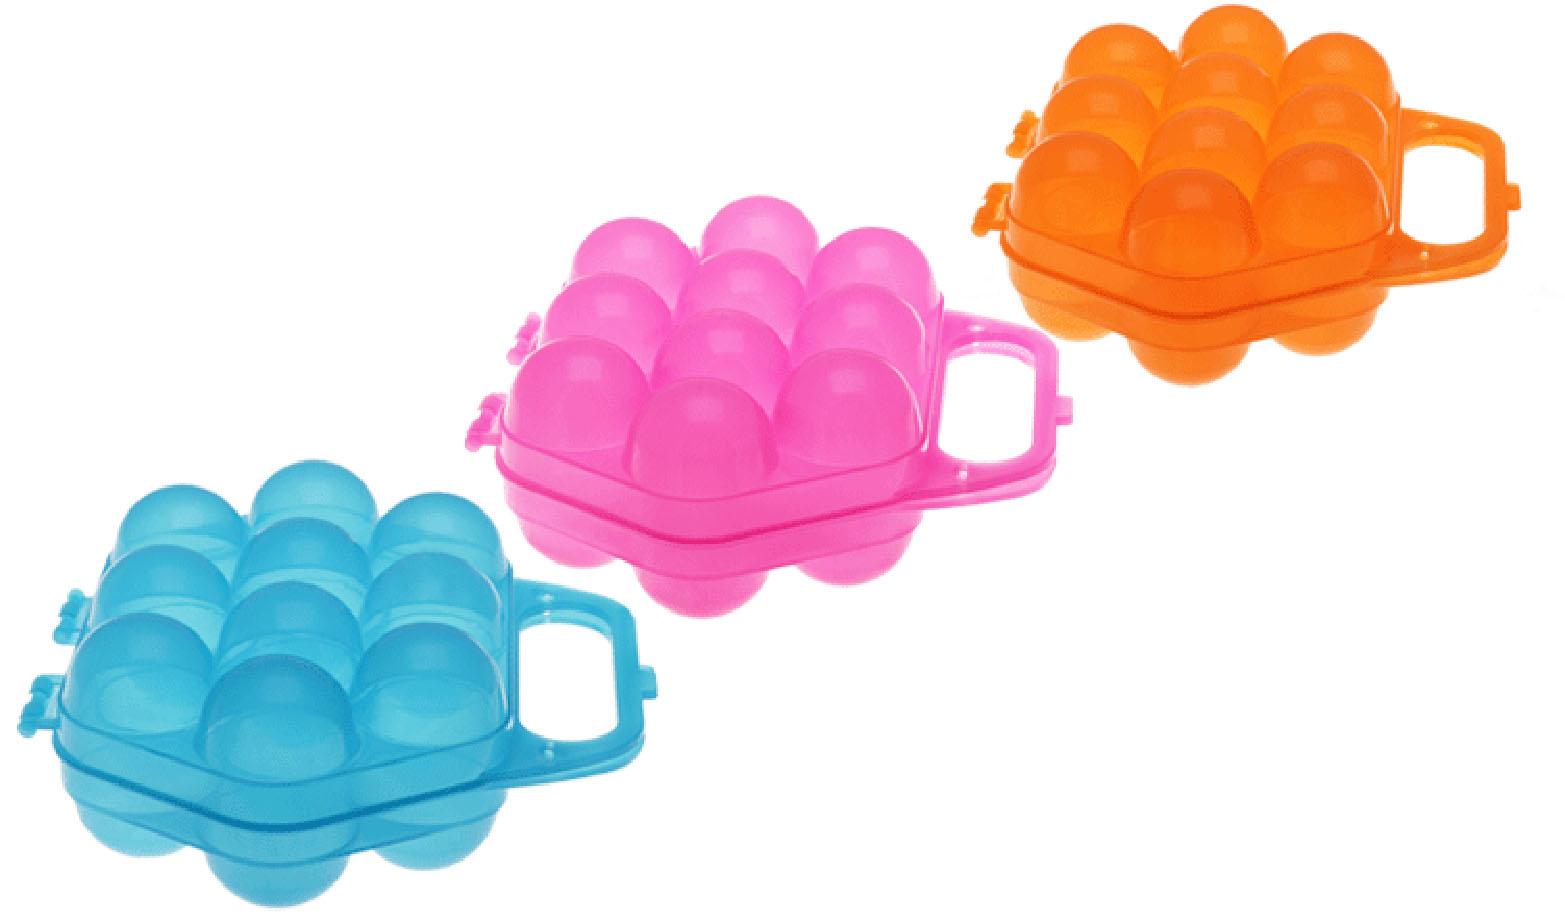 Контейнер для яиц на 10шт.2205Контейнер для яиц на 10шт.